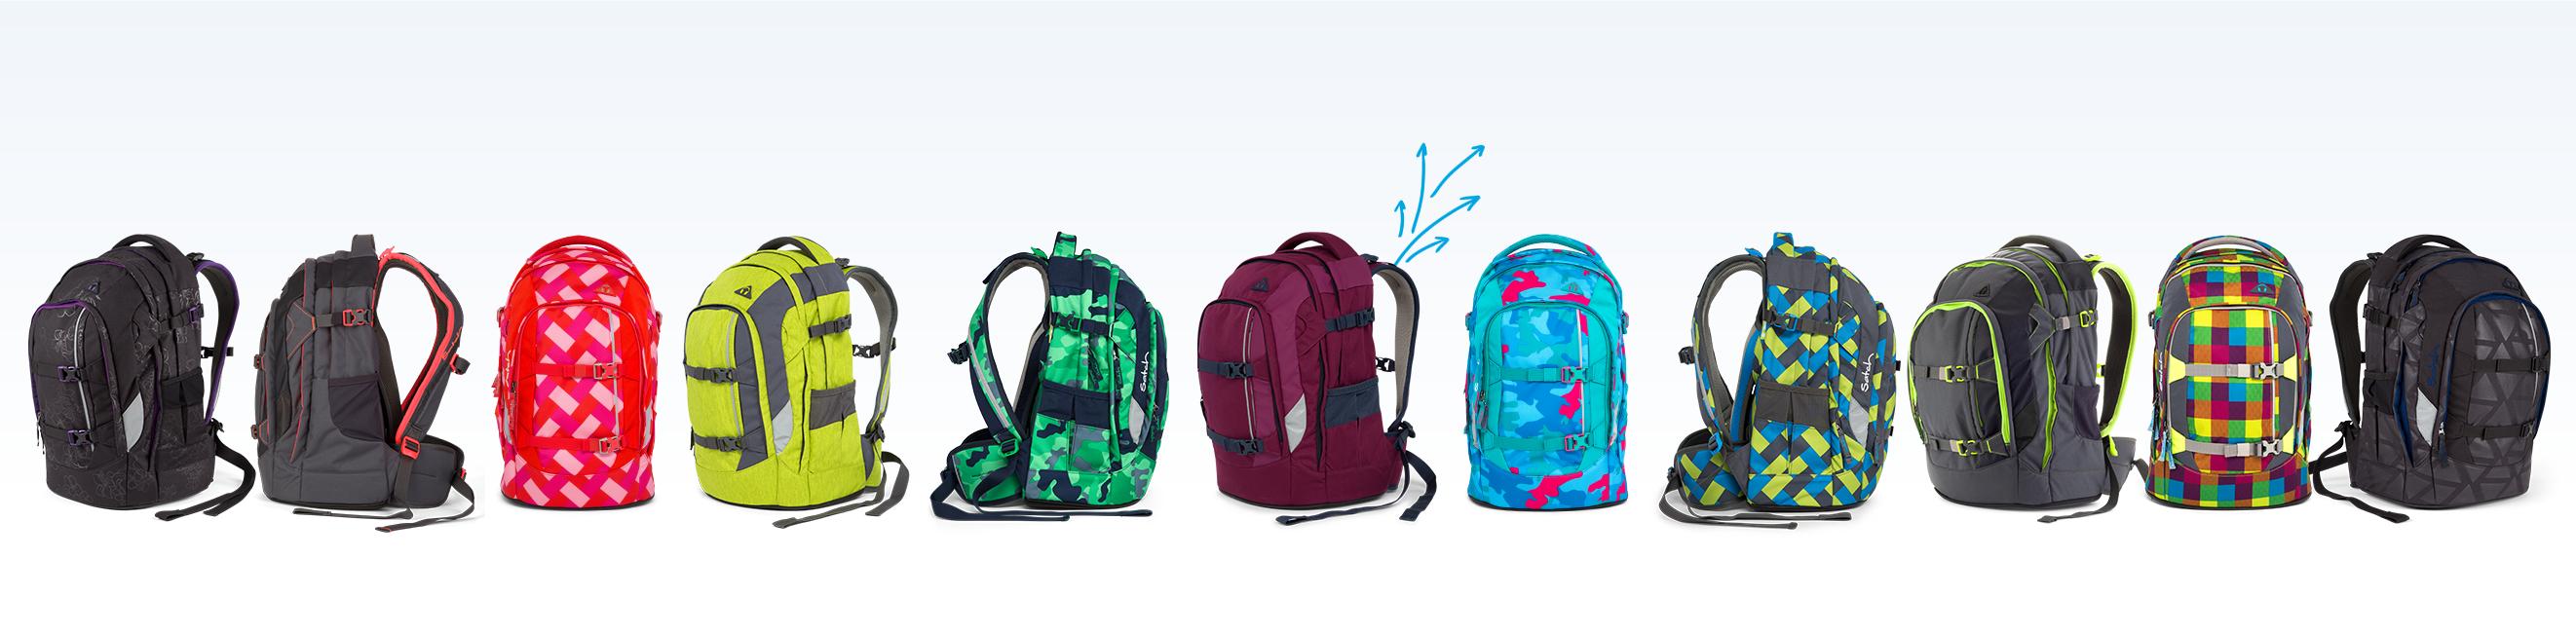 Satch Pack рюкзак для школьника цвет Beach Leach SAT-SIN-003-901, - фото 13